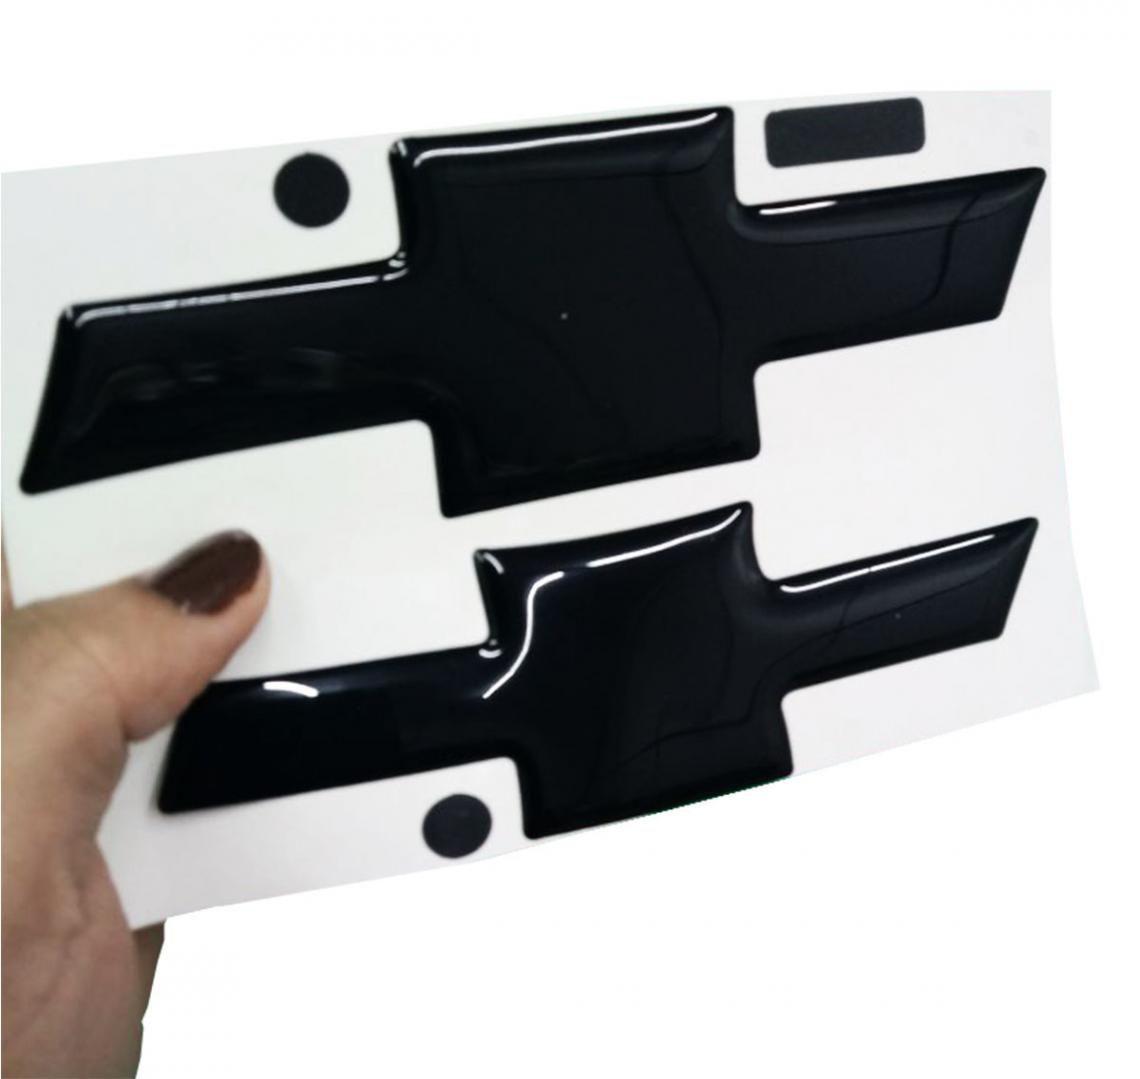 Gravata Adesiva Resinada Cruze hatch /2014 Black Piano